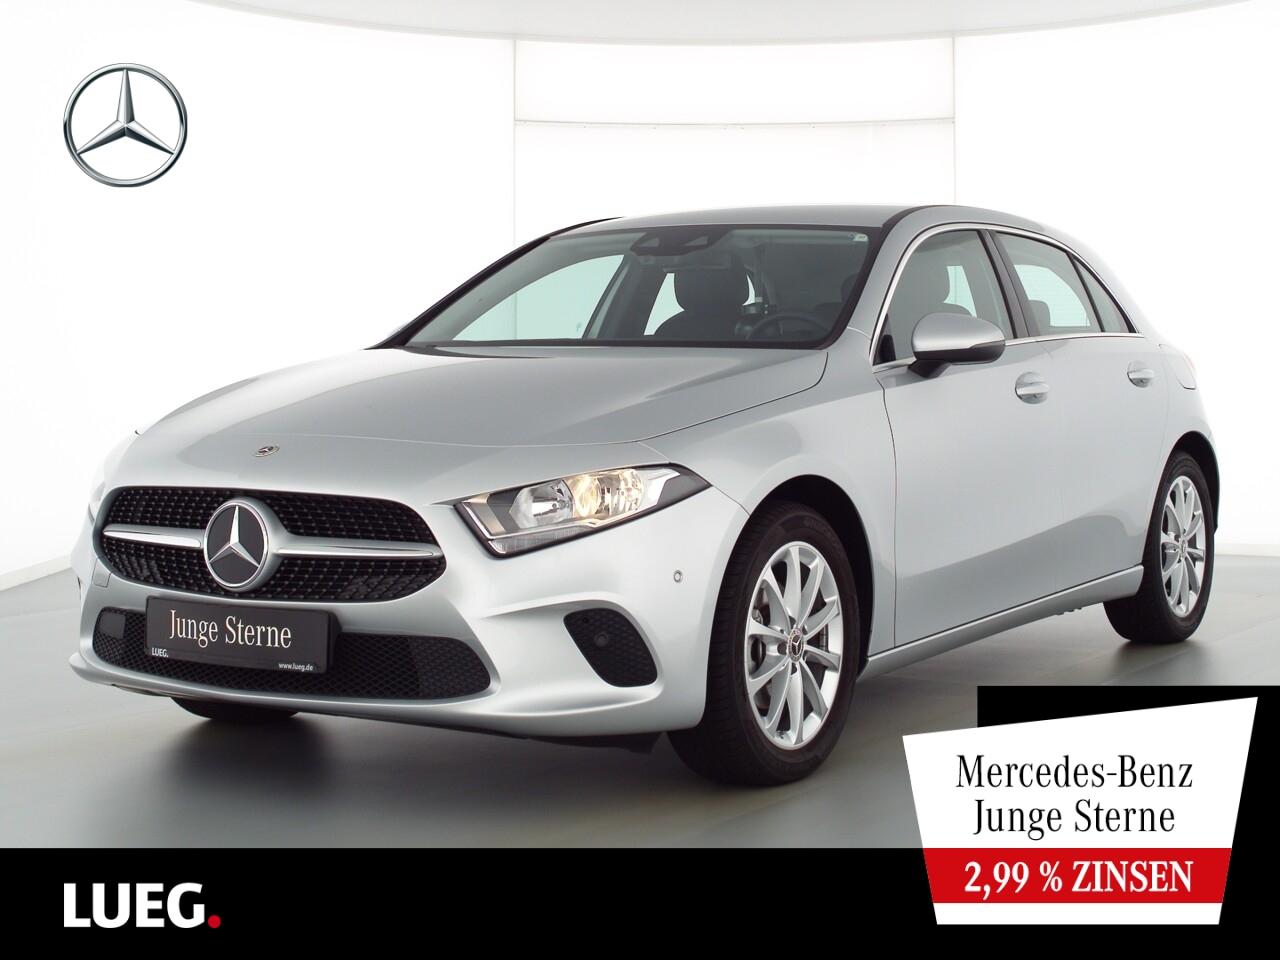 Mercedes-Benz A 180 d Progressive+MBUXHighEnd+AR+ParkAssistent, Jahr 2020, Diesel